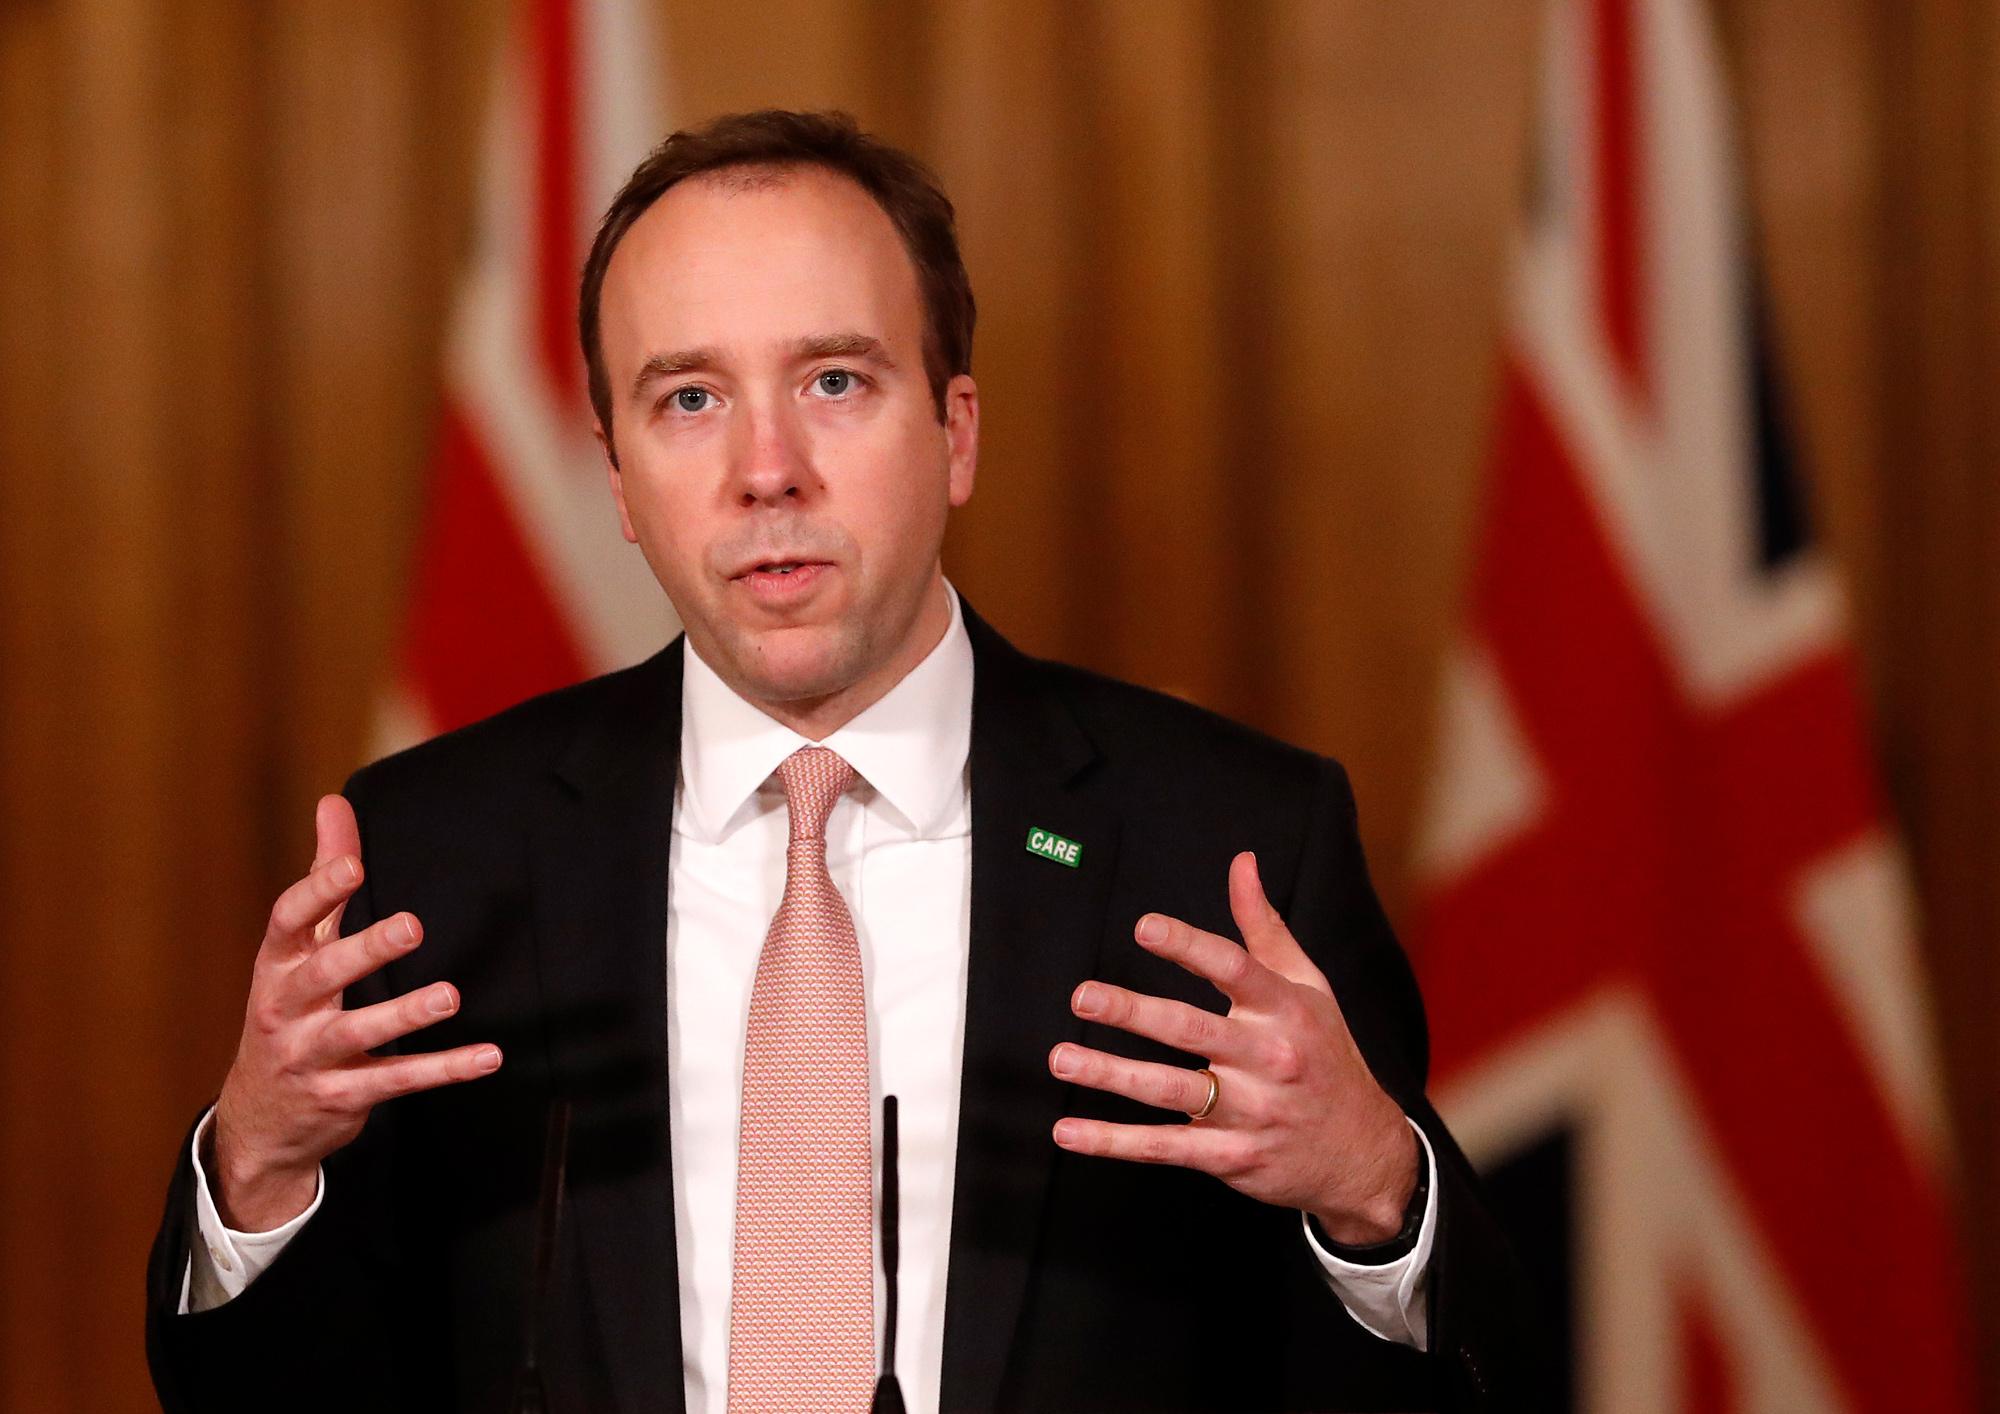 British Health Secretary Matt Hancock speaks at a coronavirus press conference inside 10 Downing Street on January 11 in London.